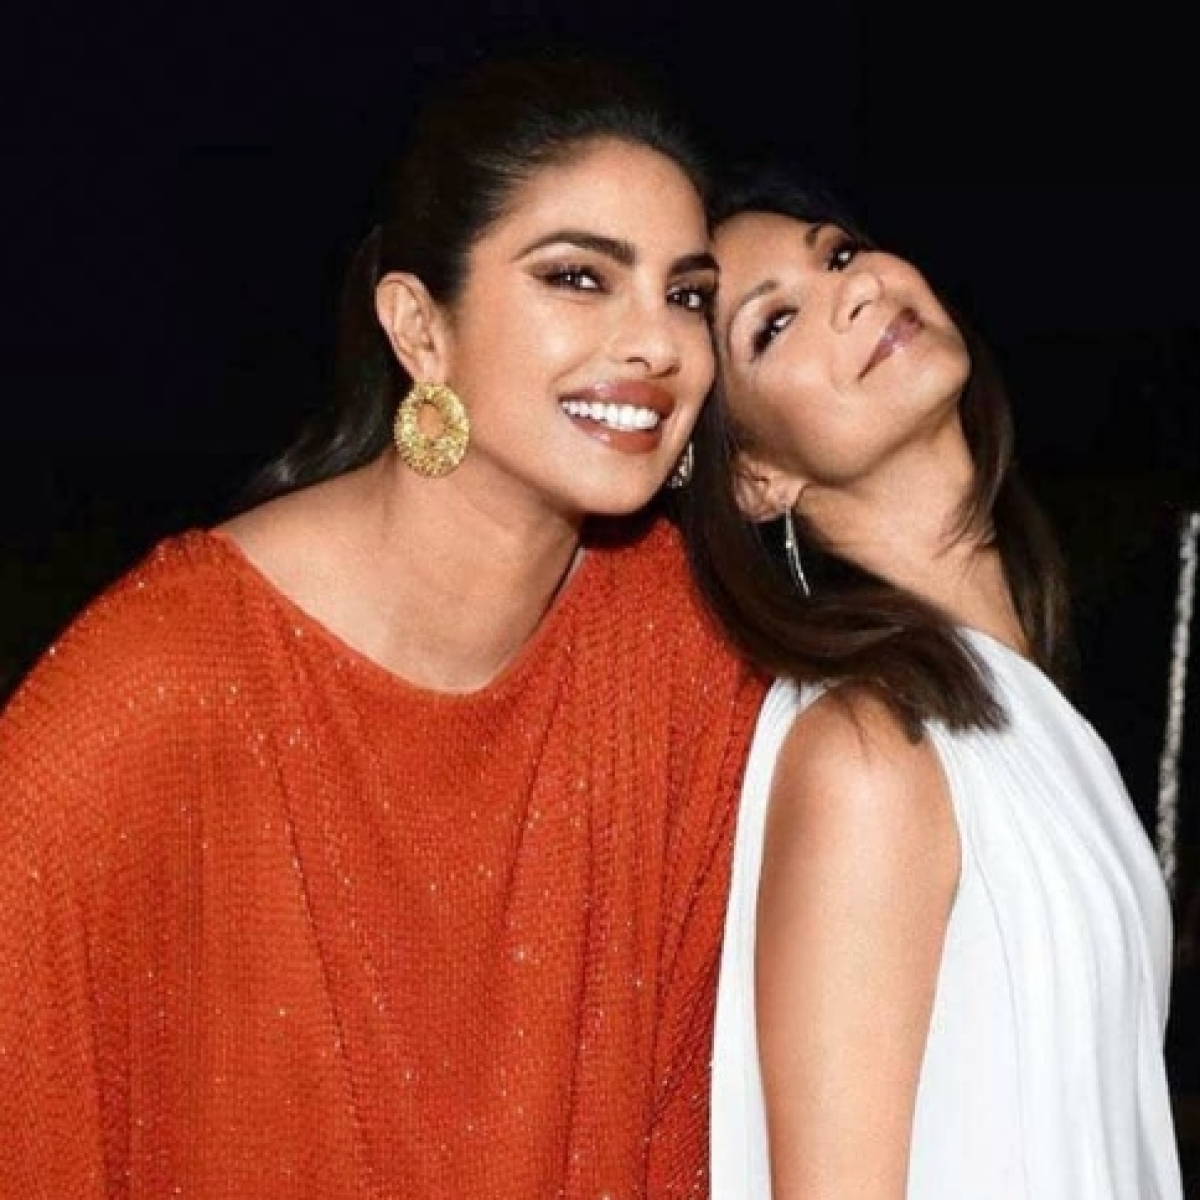 Priyanka Chopra pens down sweet birthday message for manager Anjula Acharia